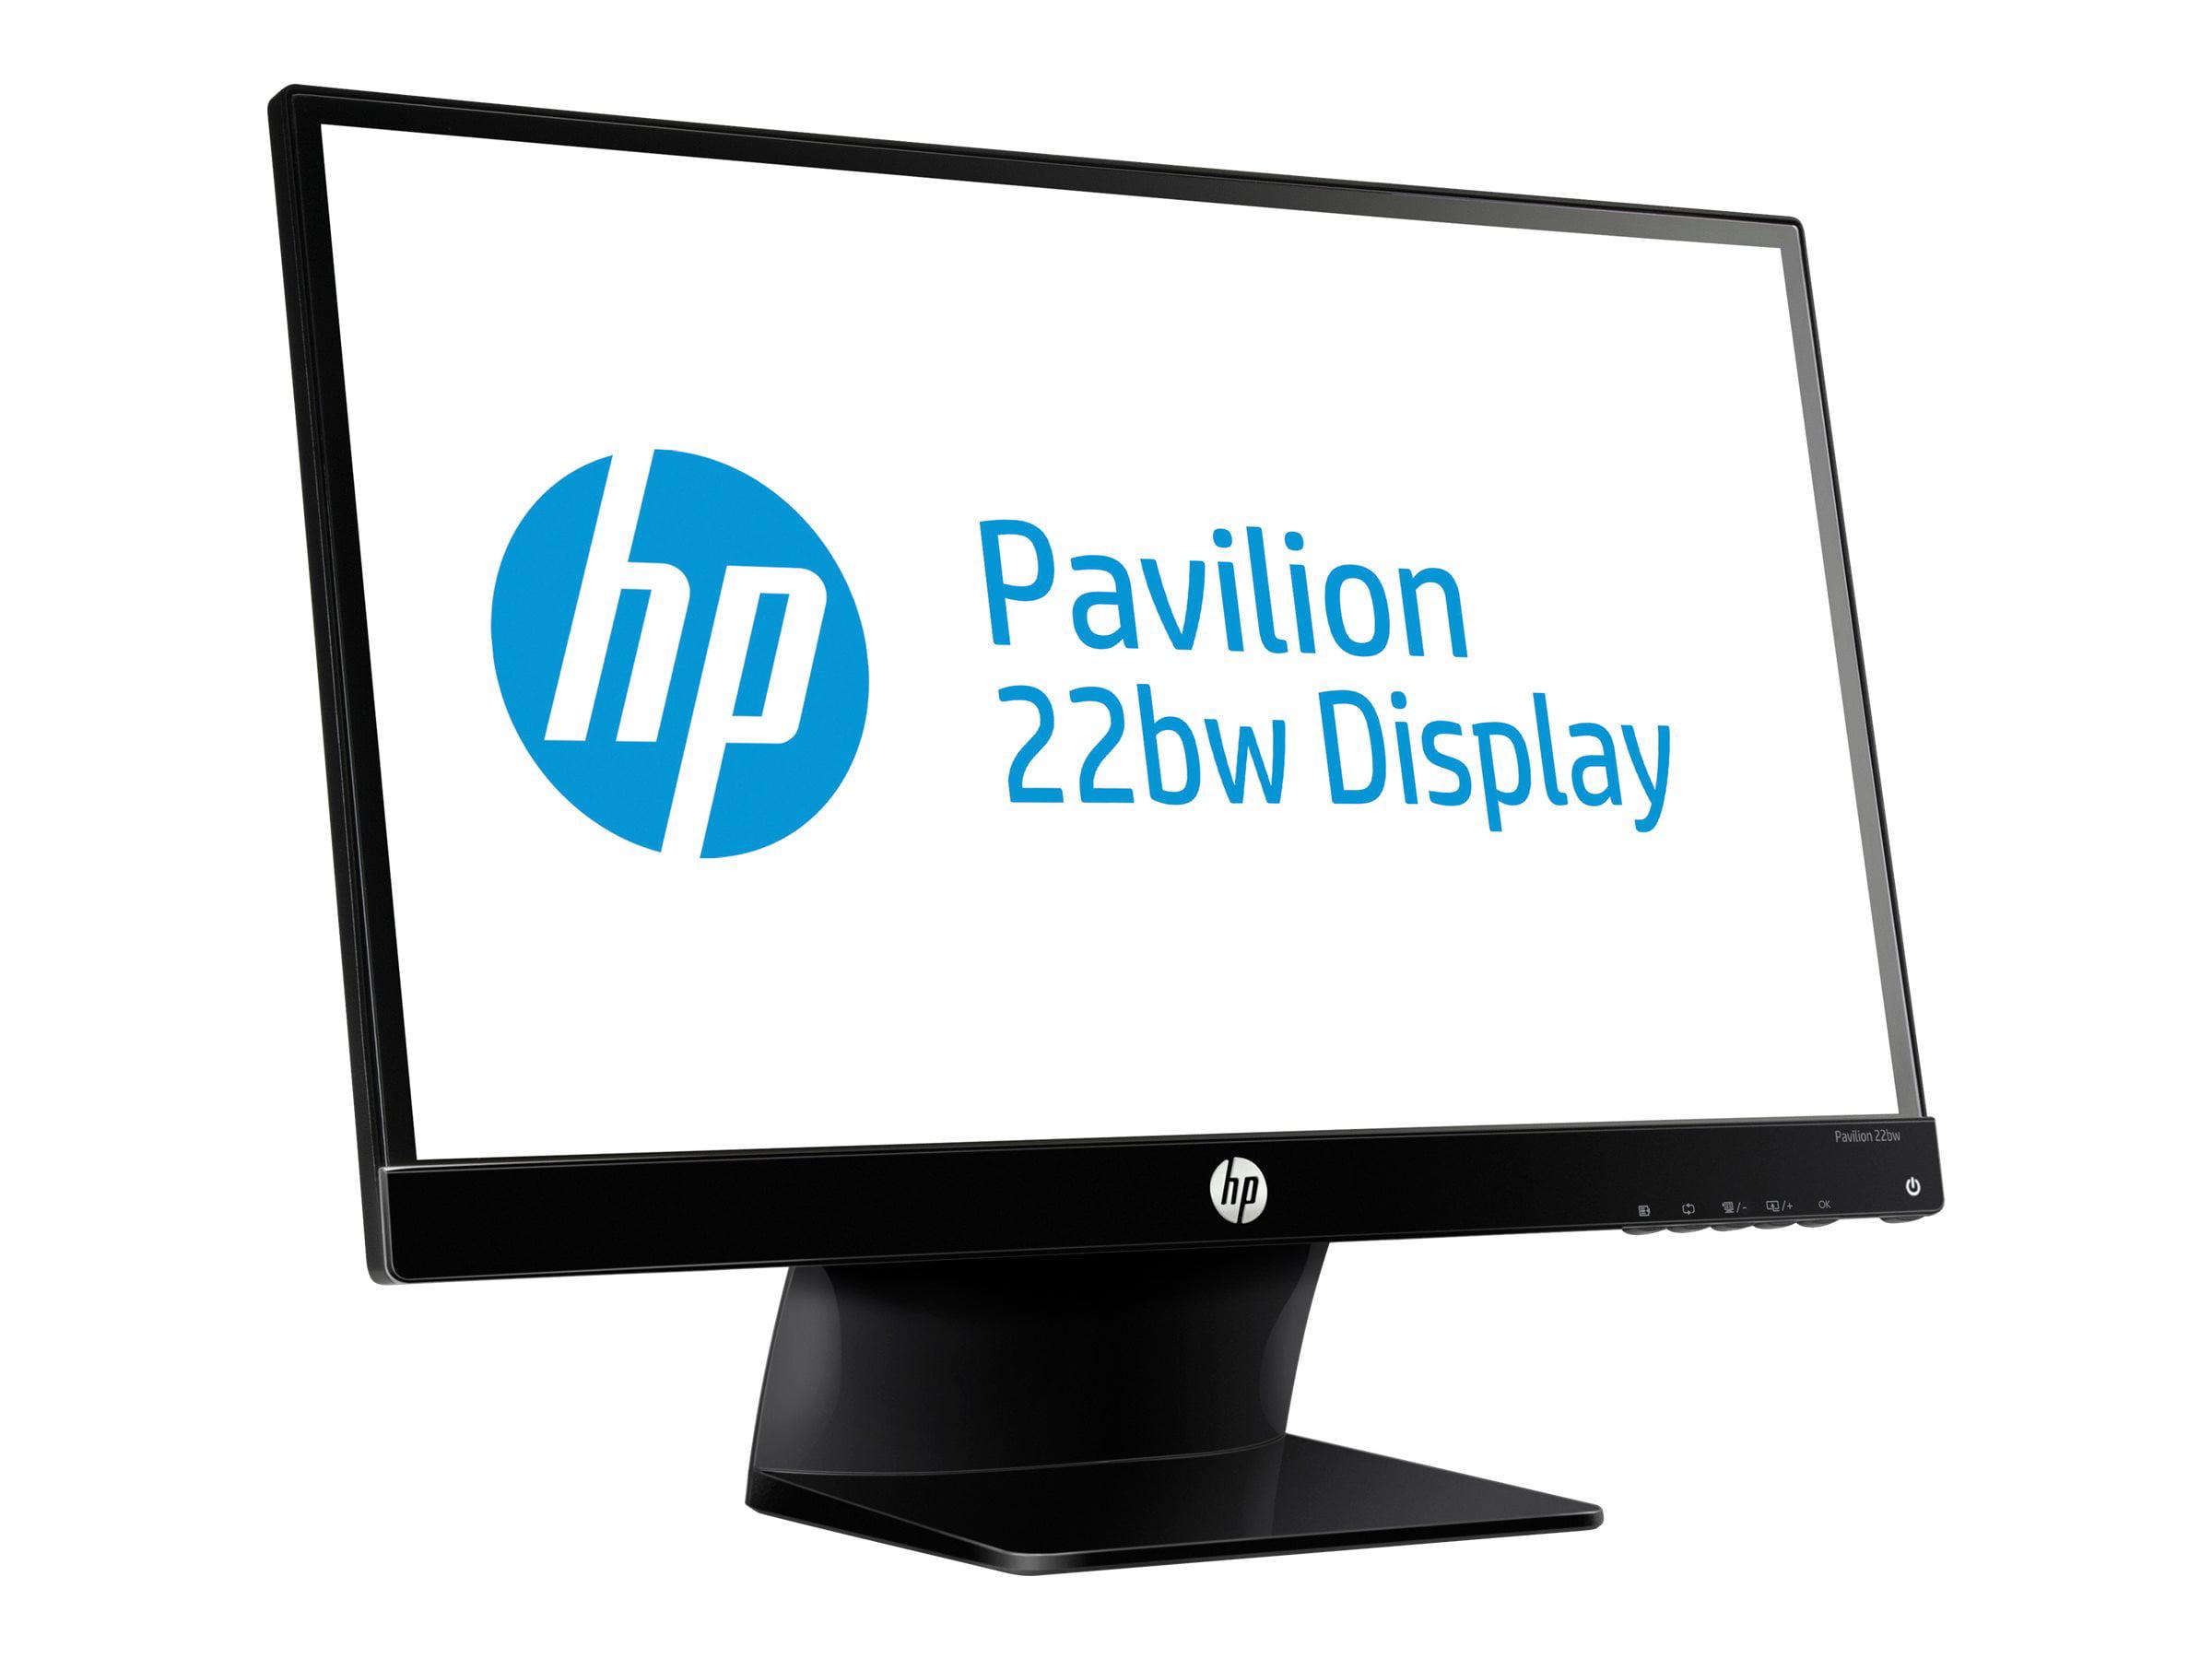 HP PAVILION 22BW DRIVER (2019)